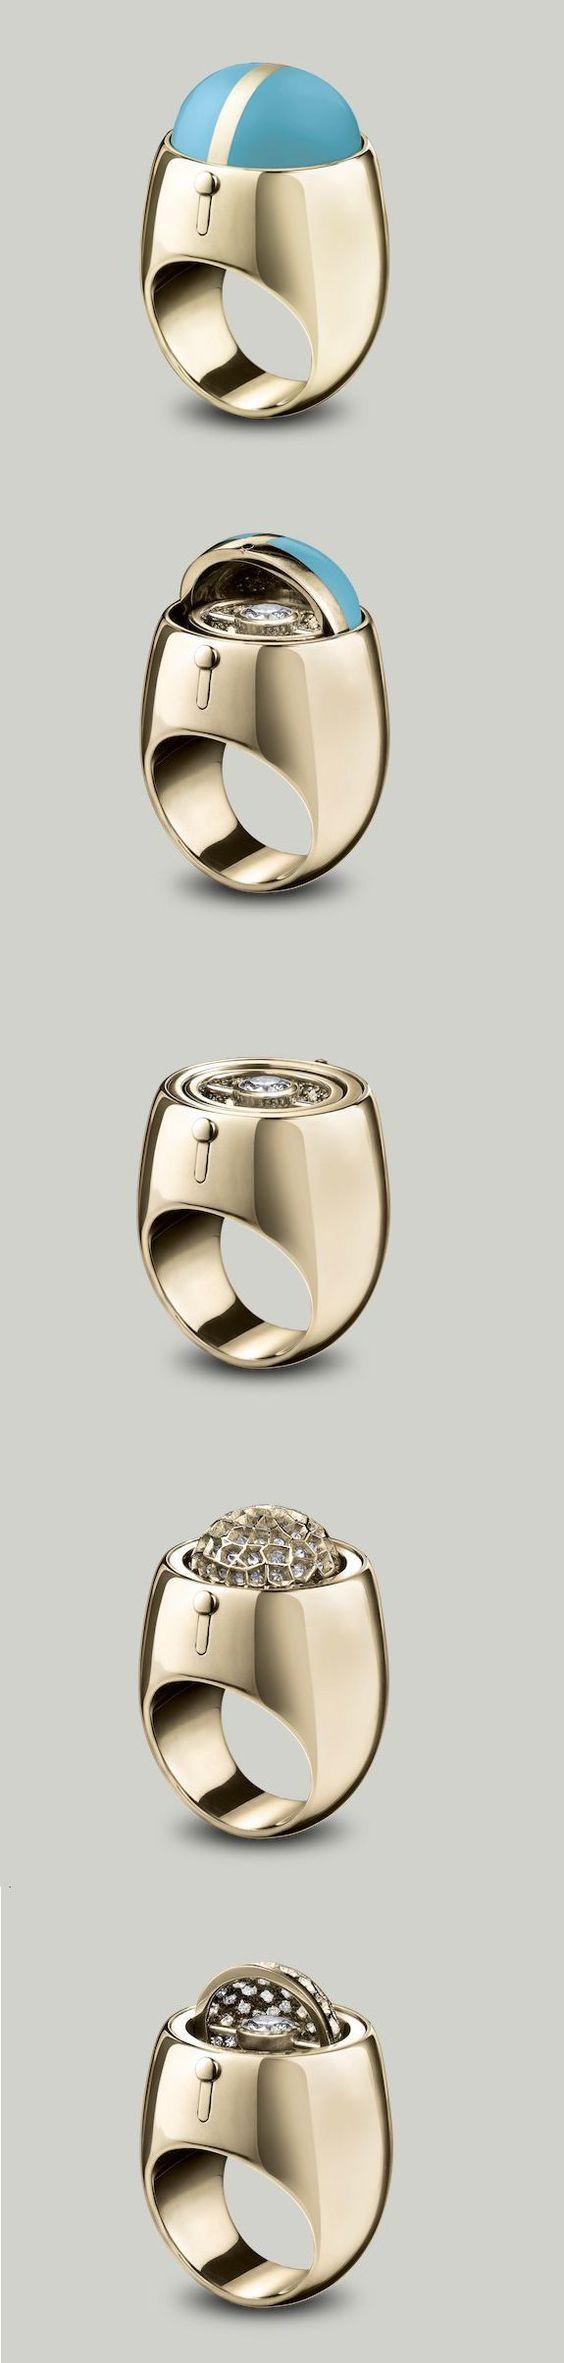 Solange Azagury-Partridge Secret Diamond ring An enamel dome swivels to reveal a brilliant cut Diamond sitting in a pavé Diamond set cup in 18ct yellow gold